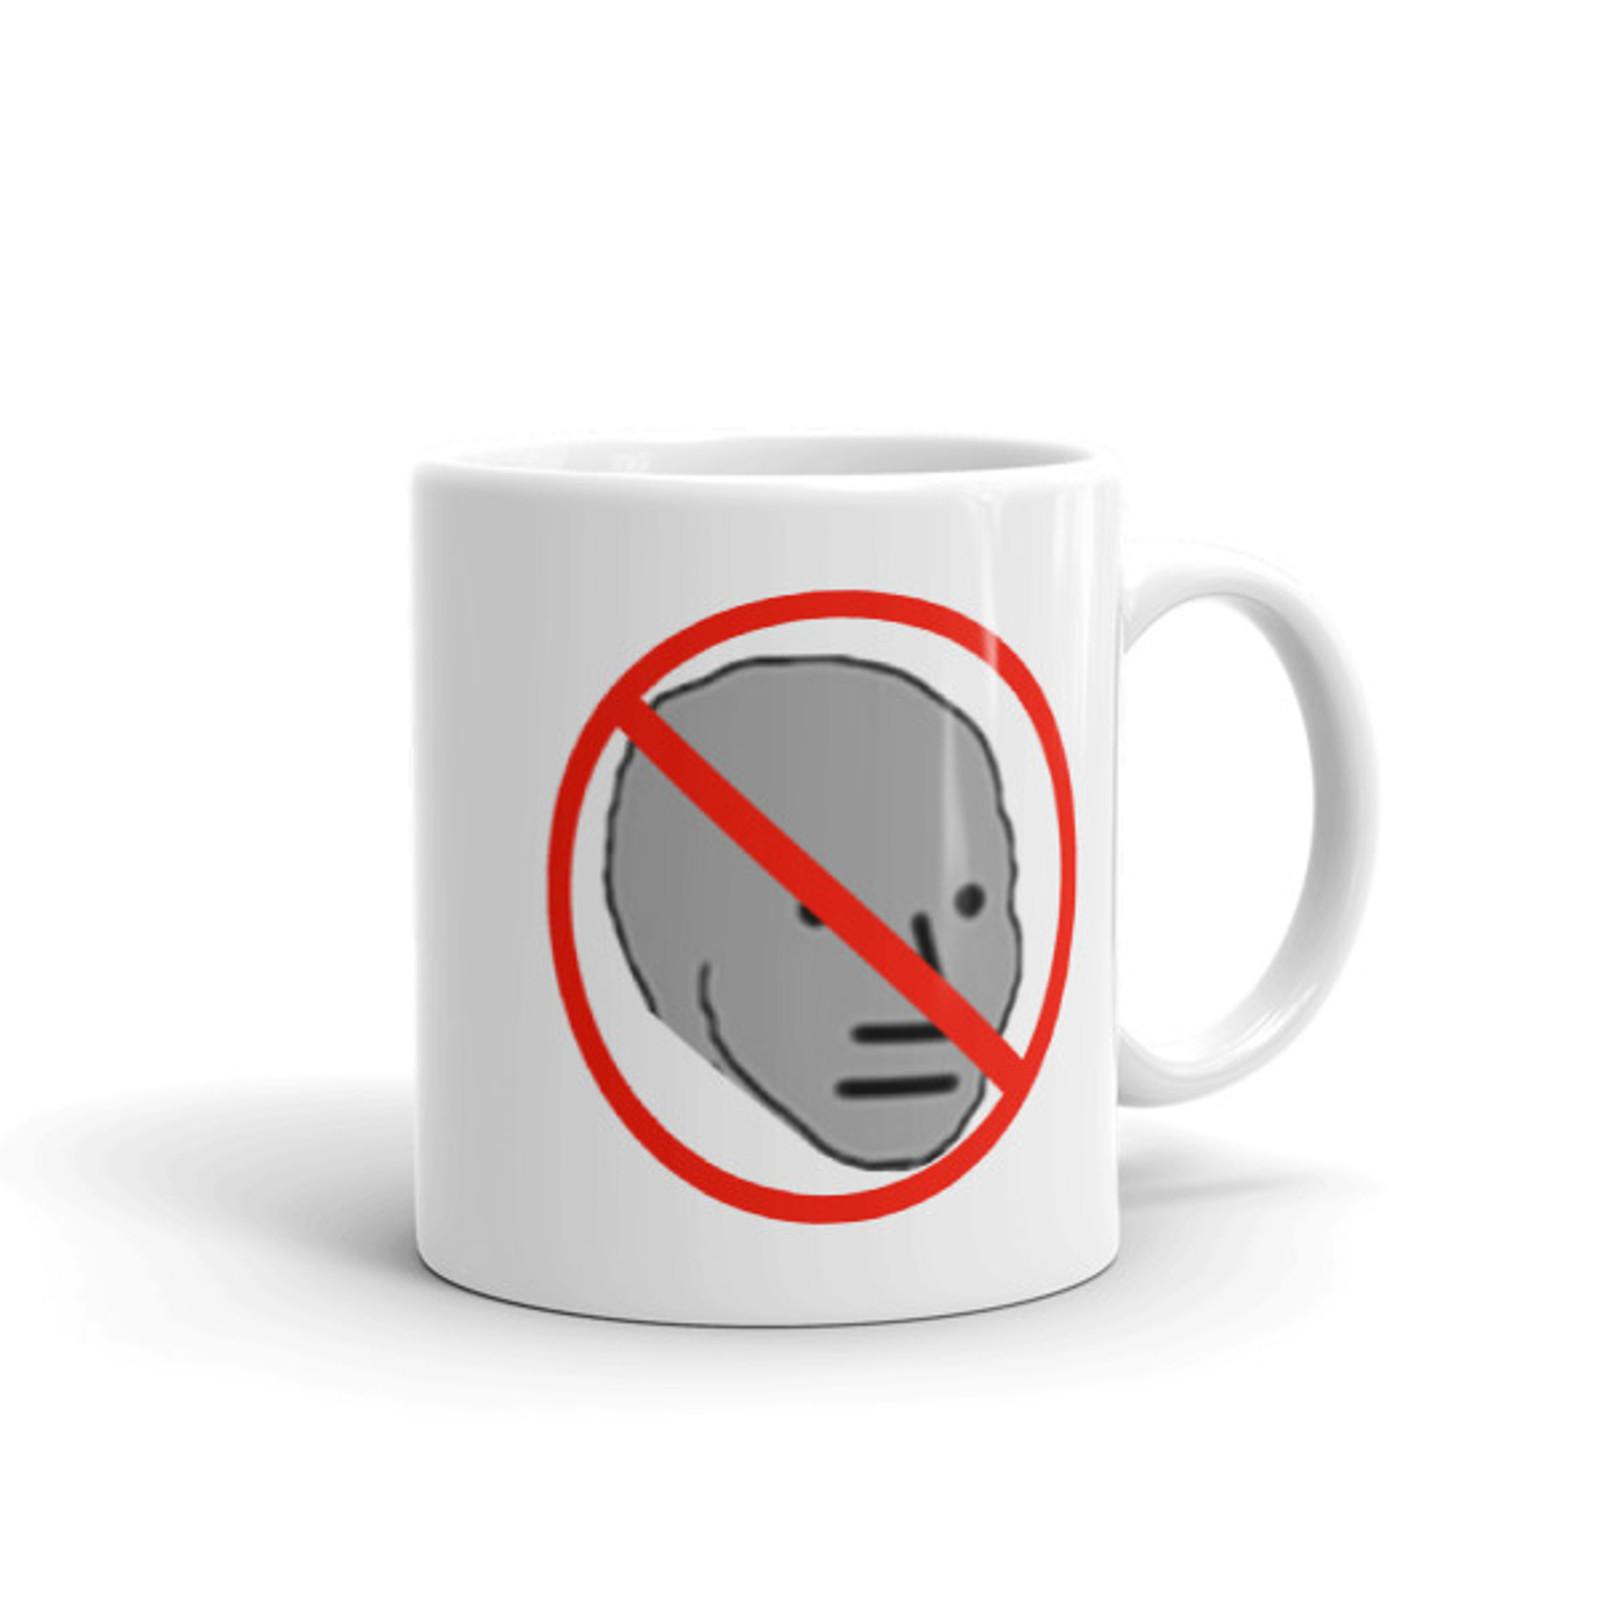 Anti-NPCoffee Mug